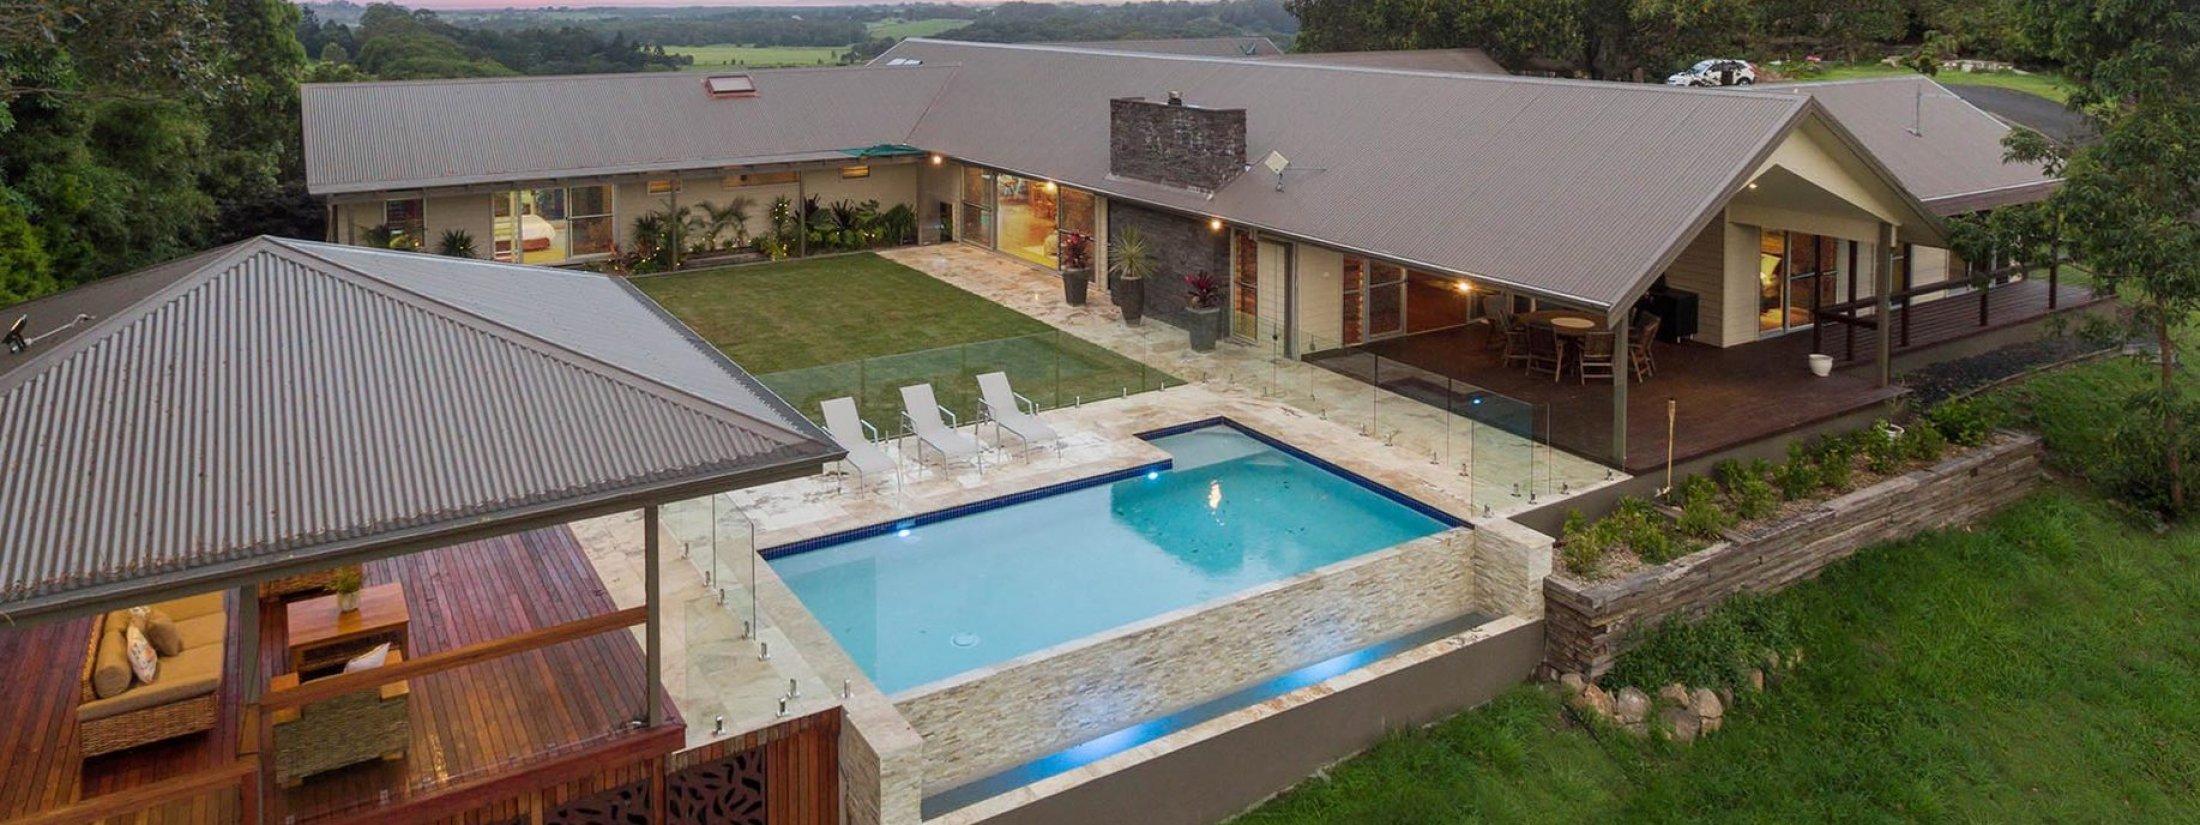 Serene Myocum - Byron Bay - House Pool and Cabana c